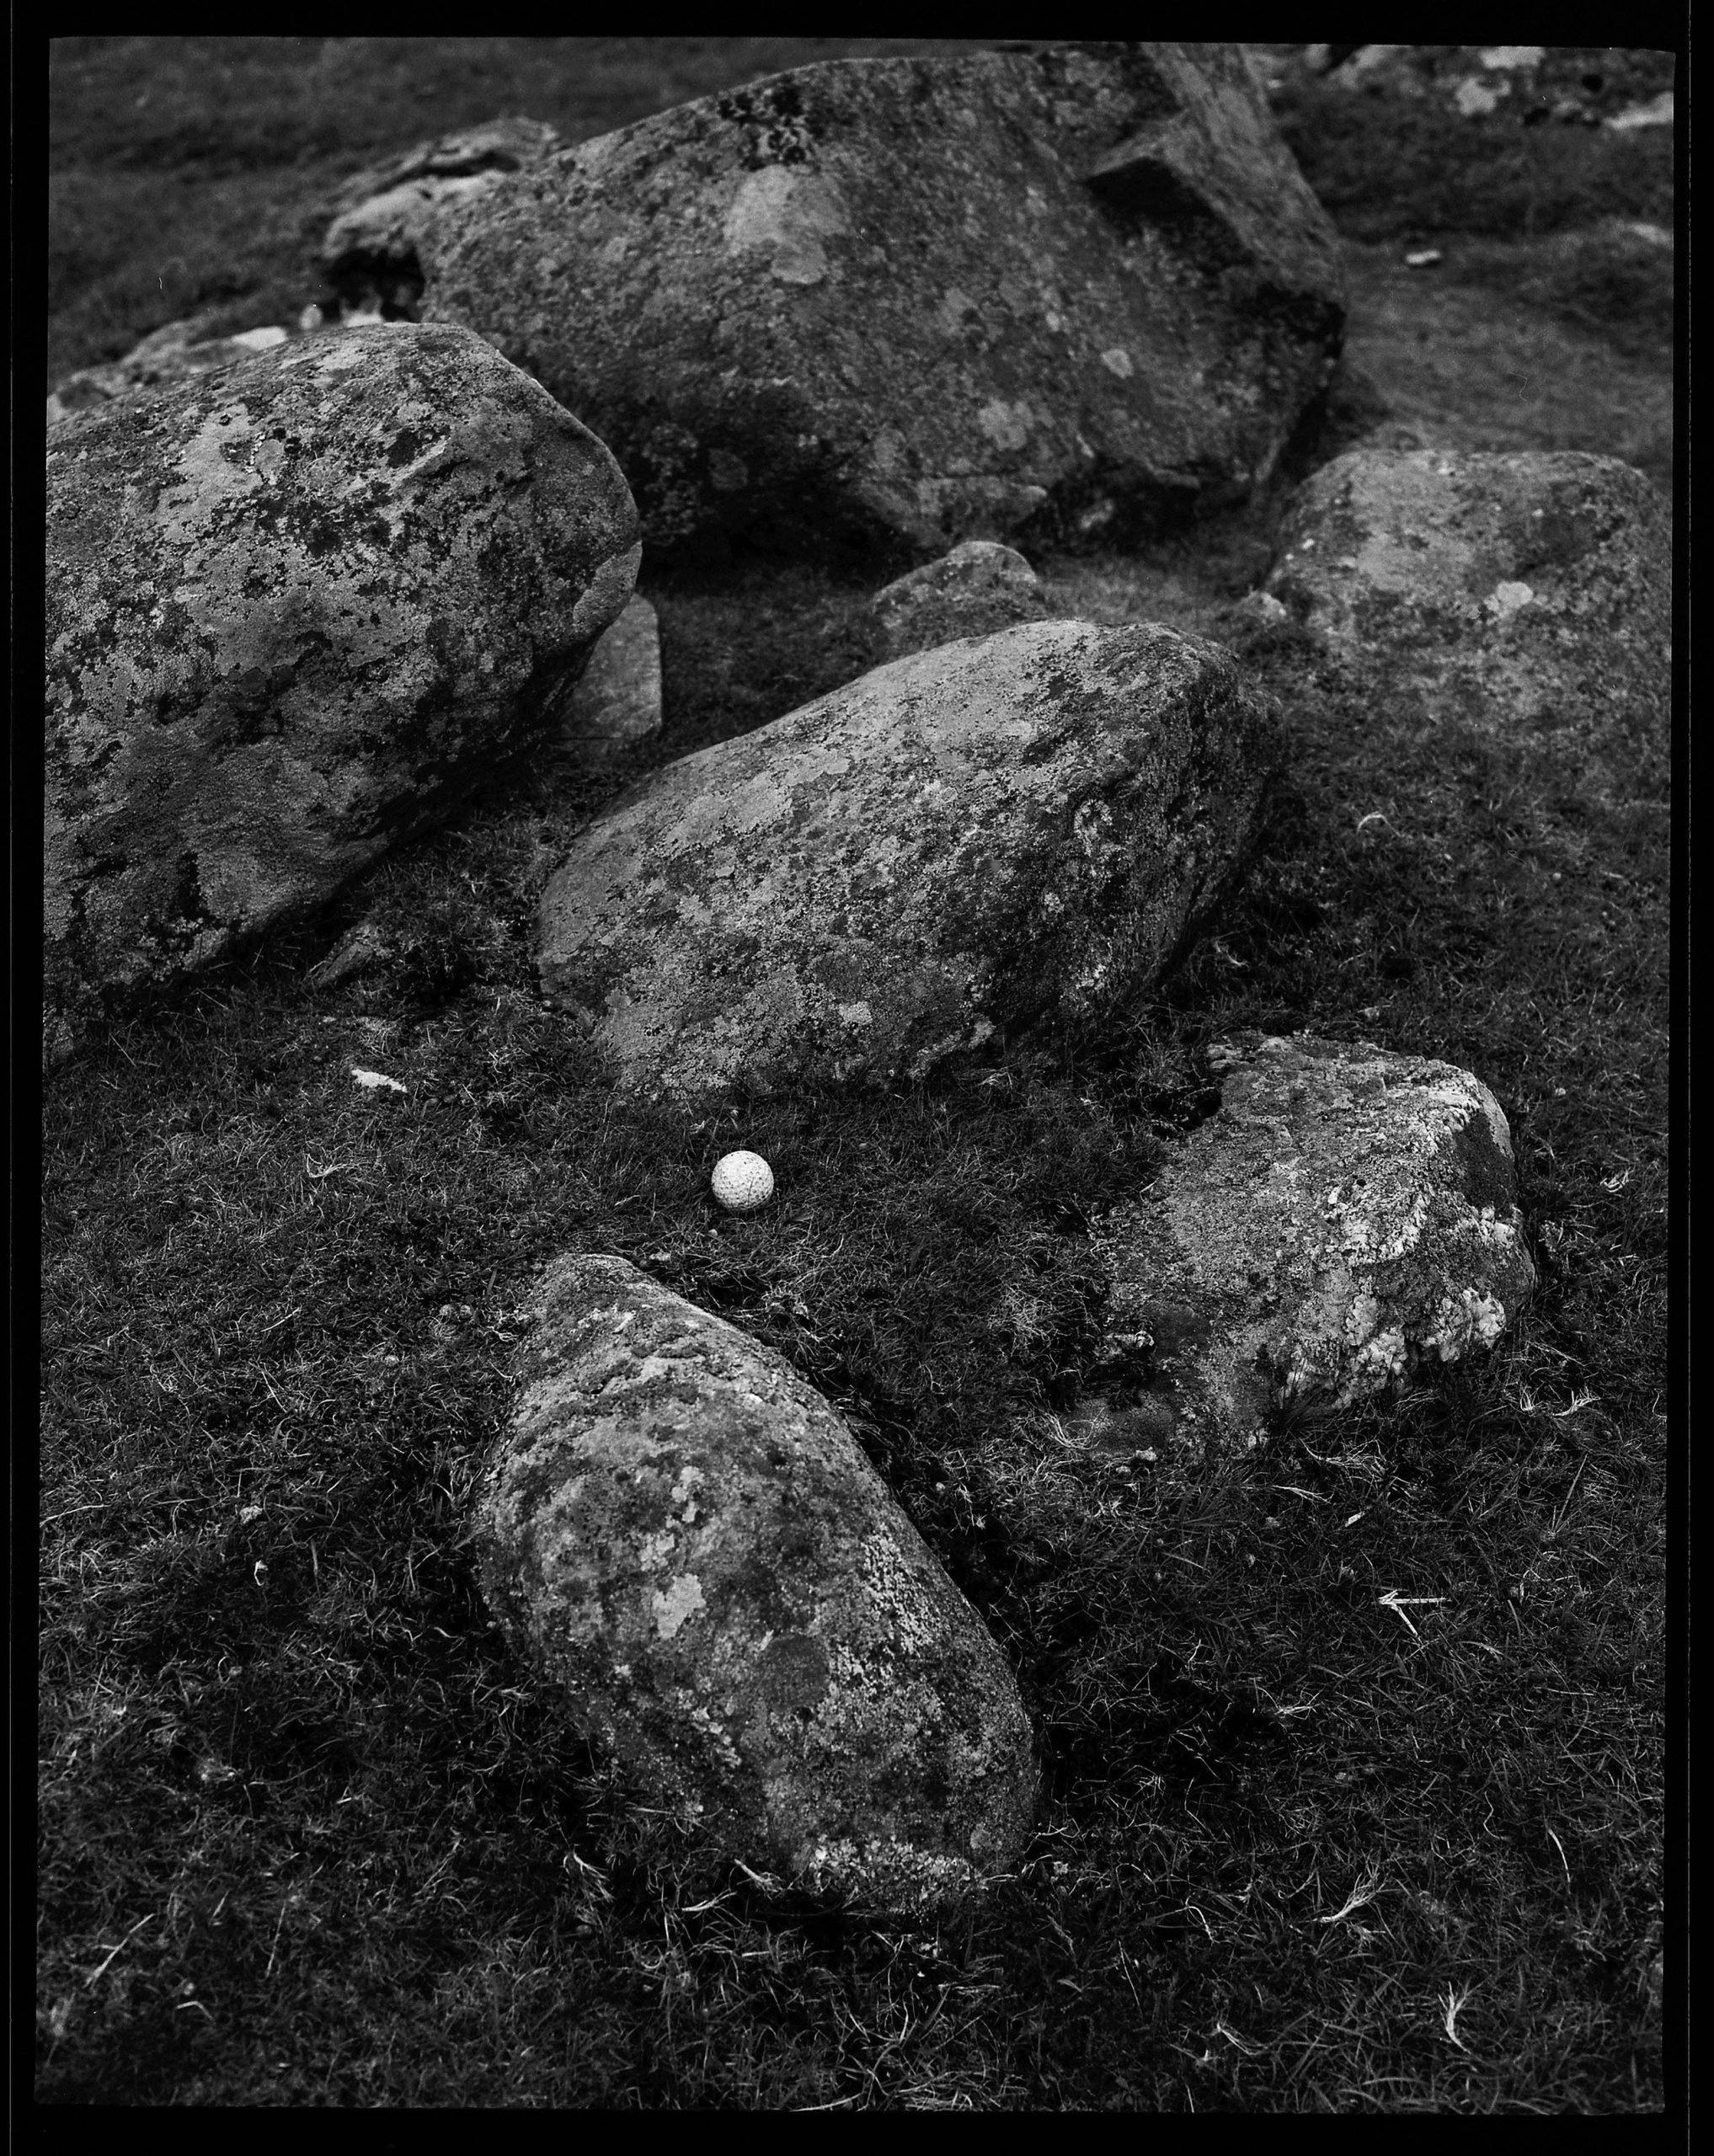 golf ball in rocks